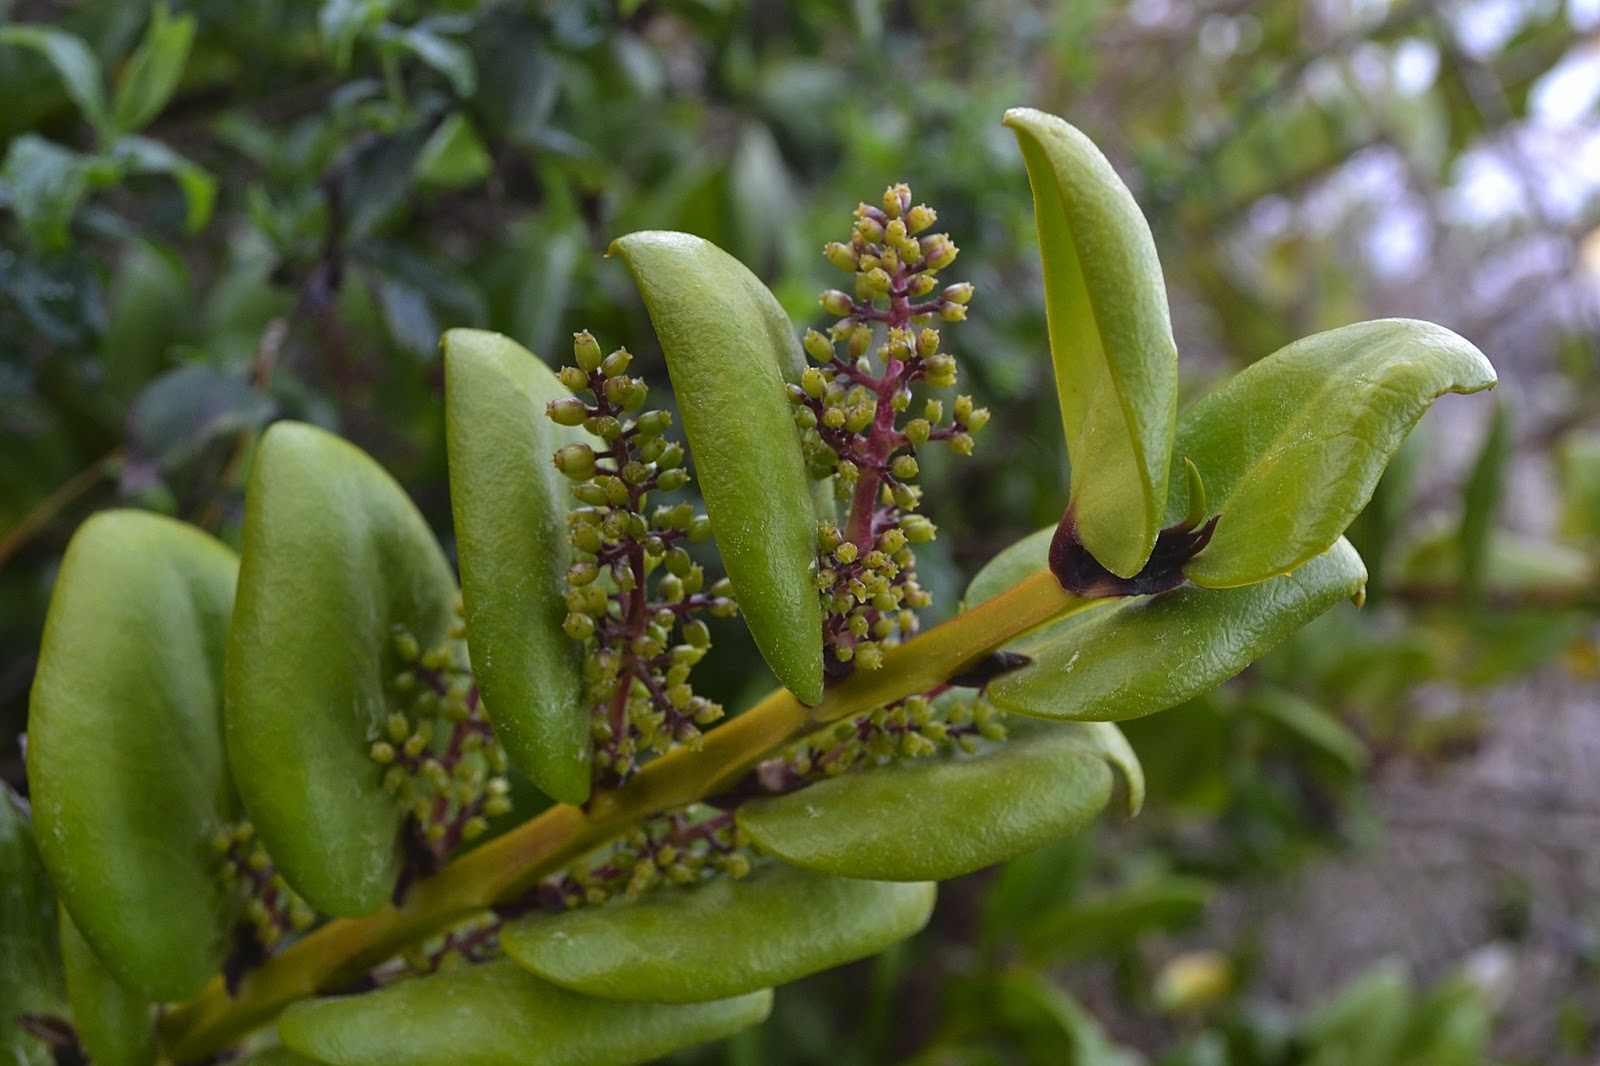 Ndice de plantas trepadoras plantas trepadoras ep fitas - Plantas trepadoras de sol ...